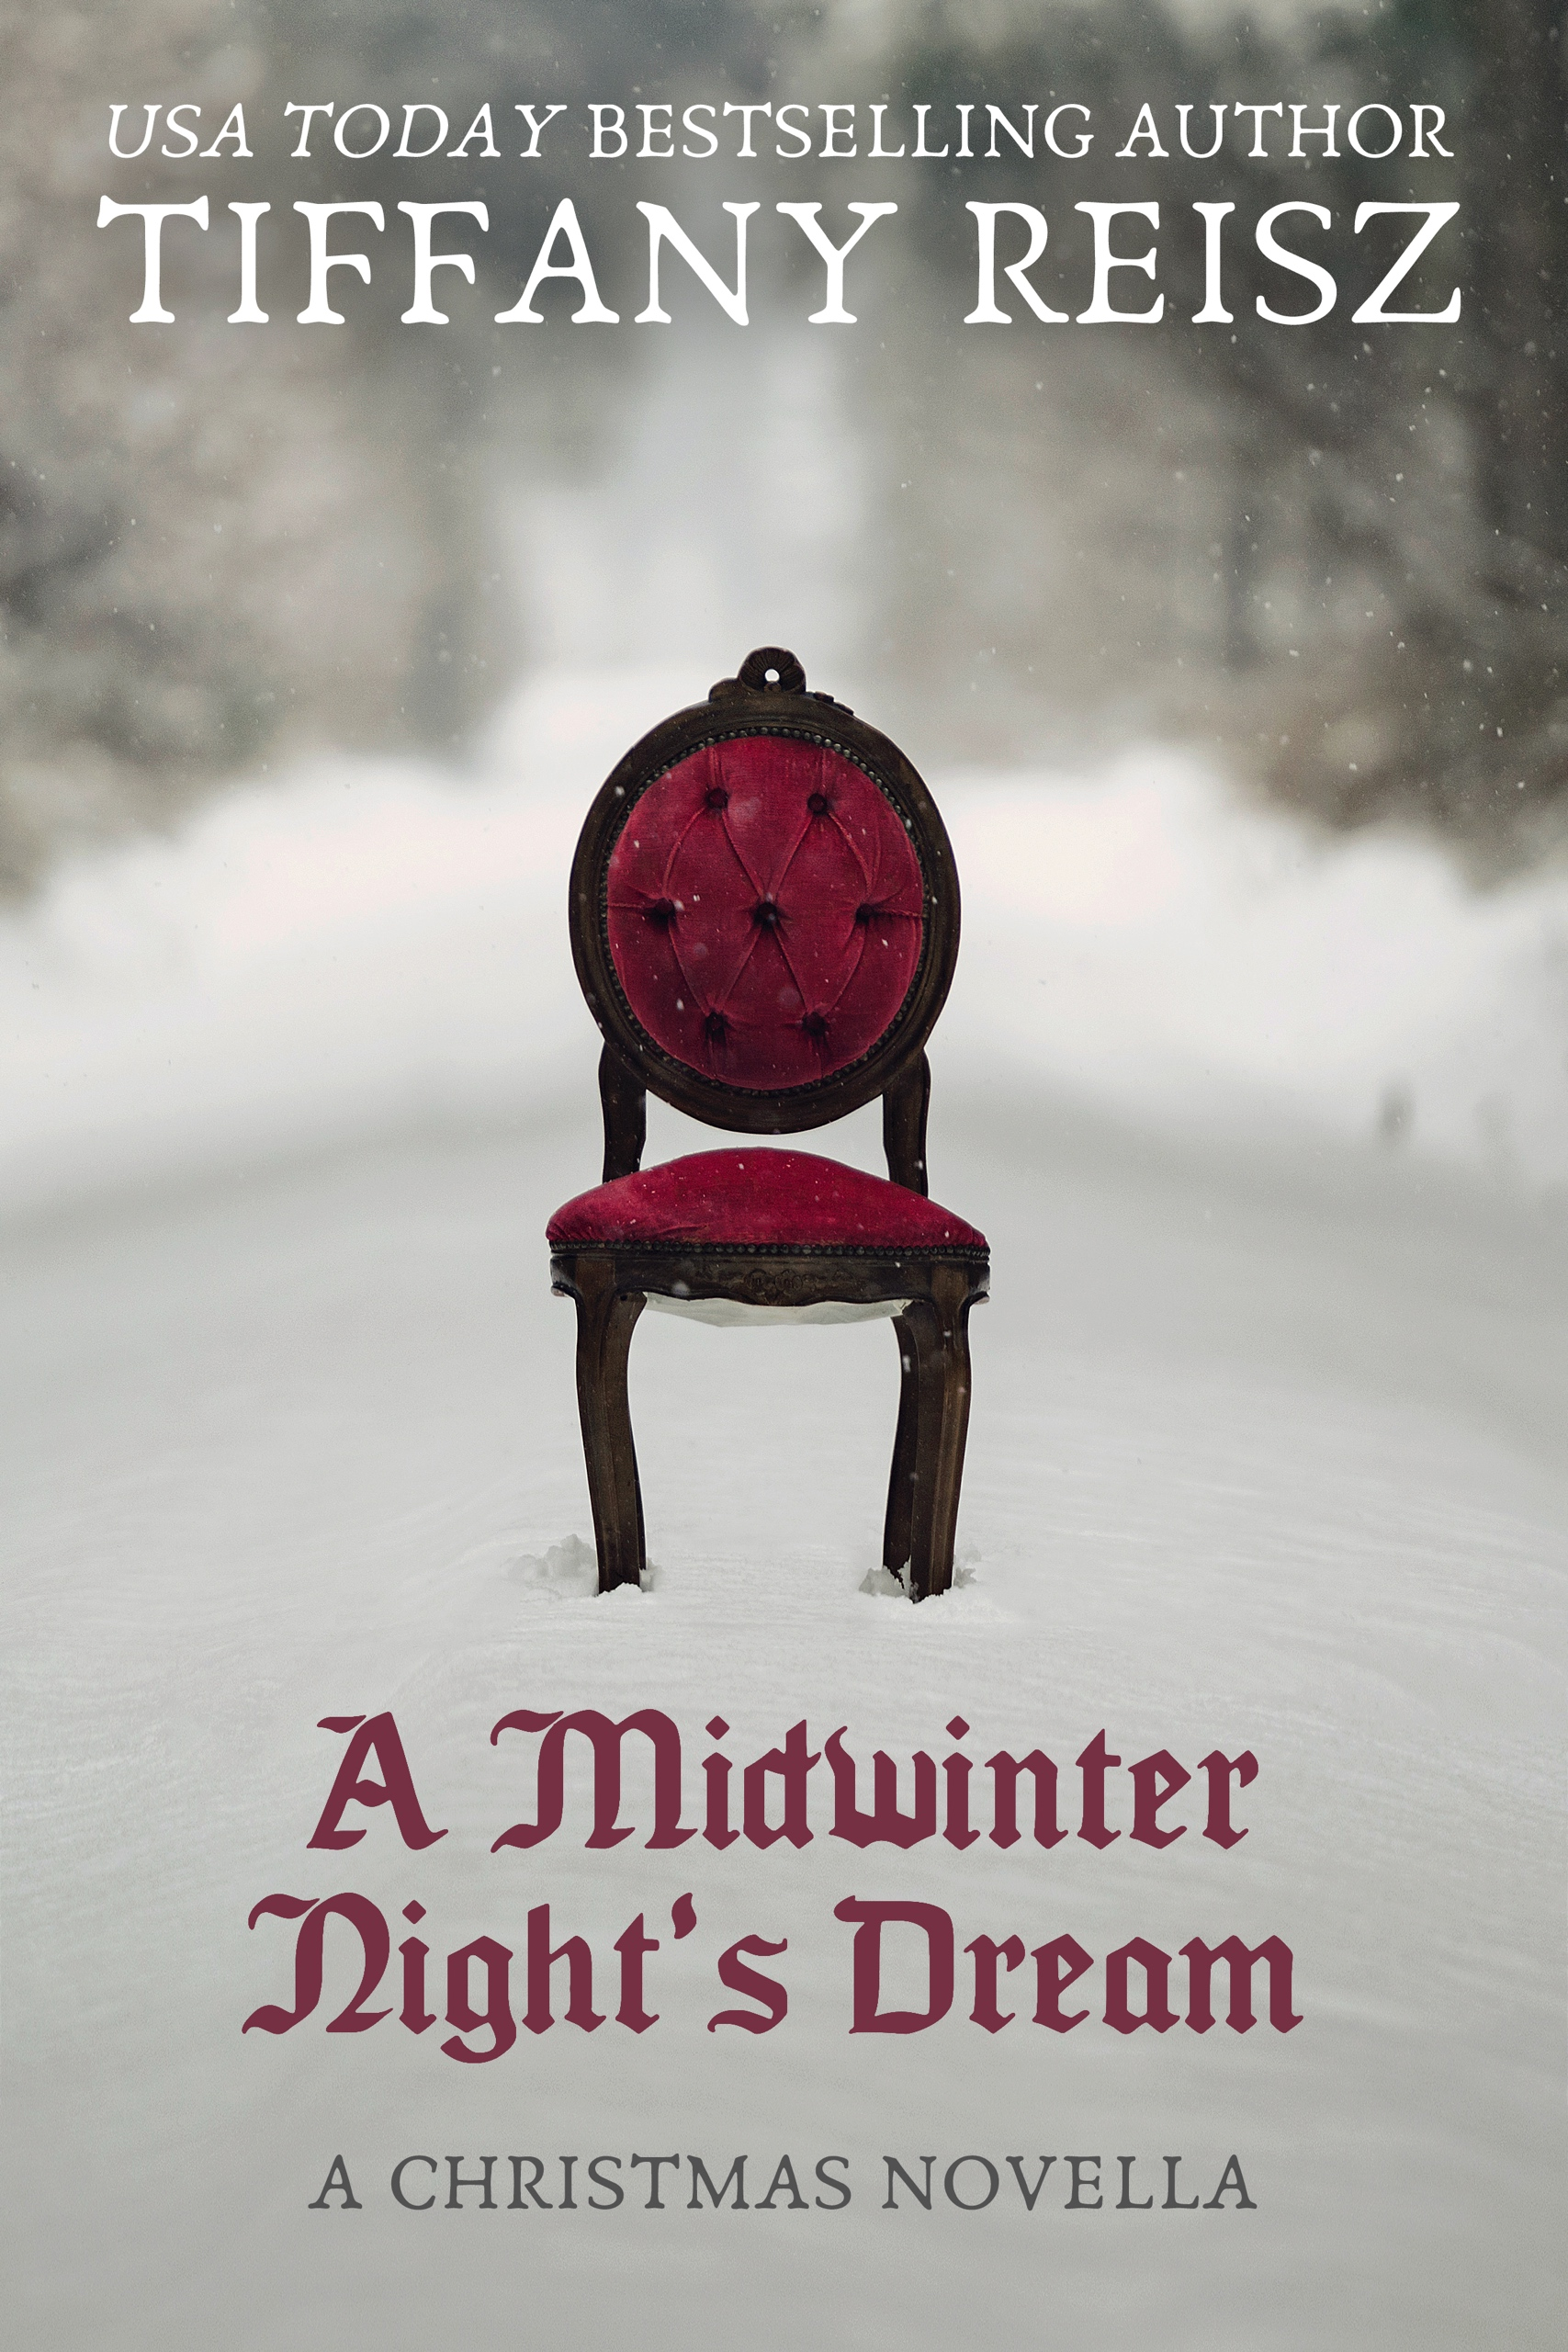 A-Midwinter-Nights-Dream-Kindle.jpg